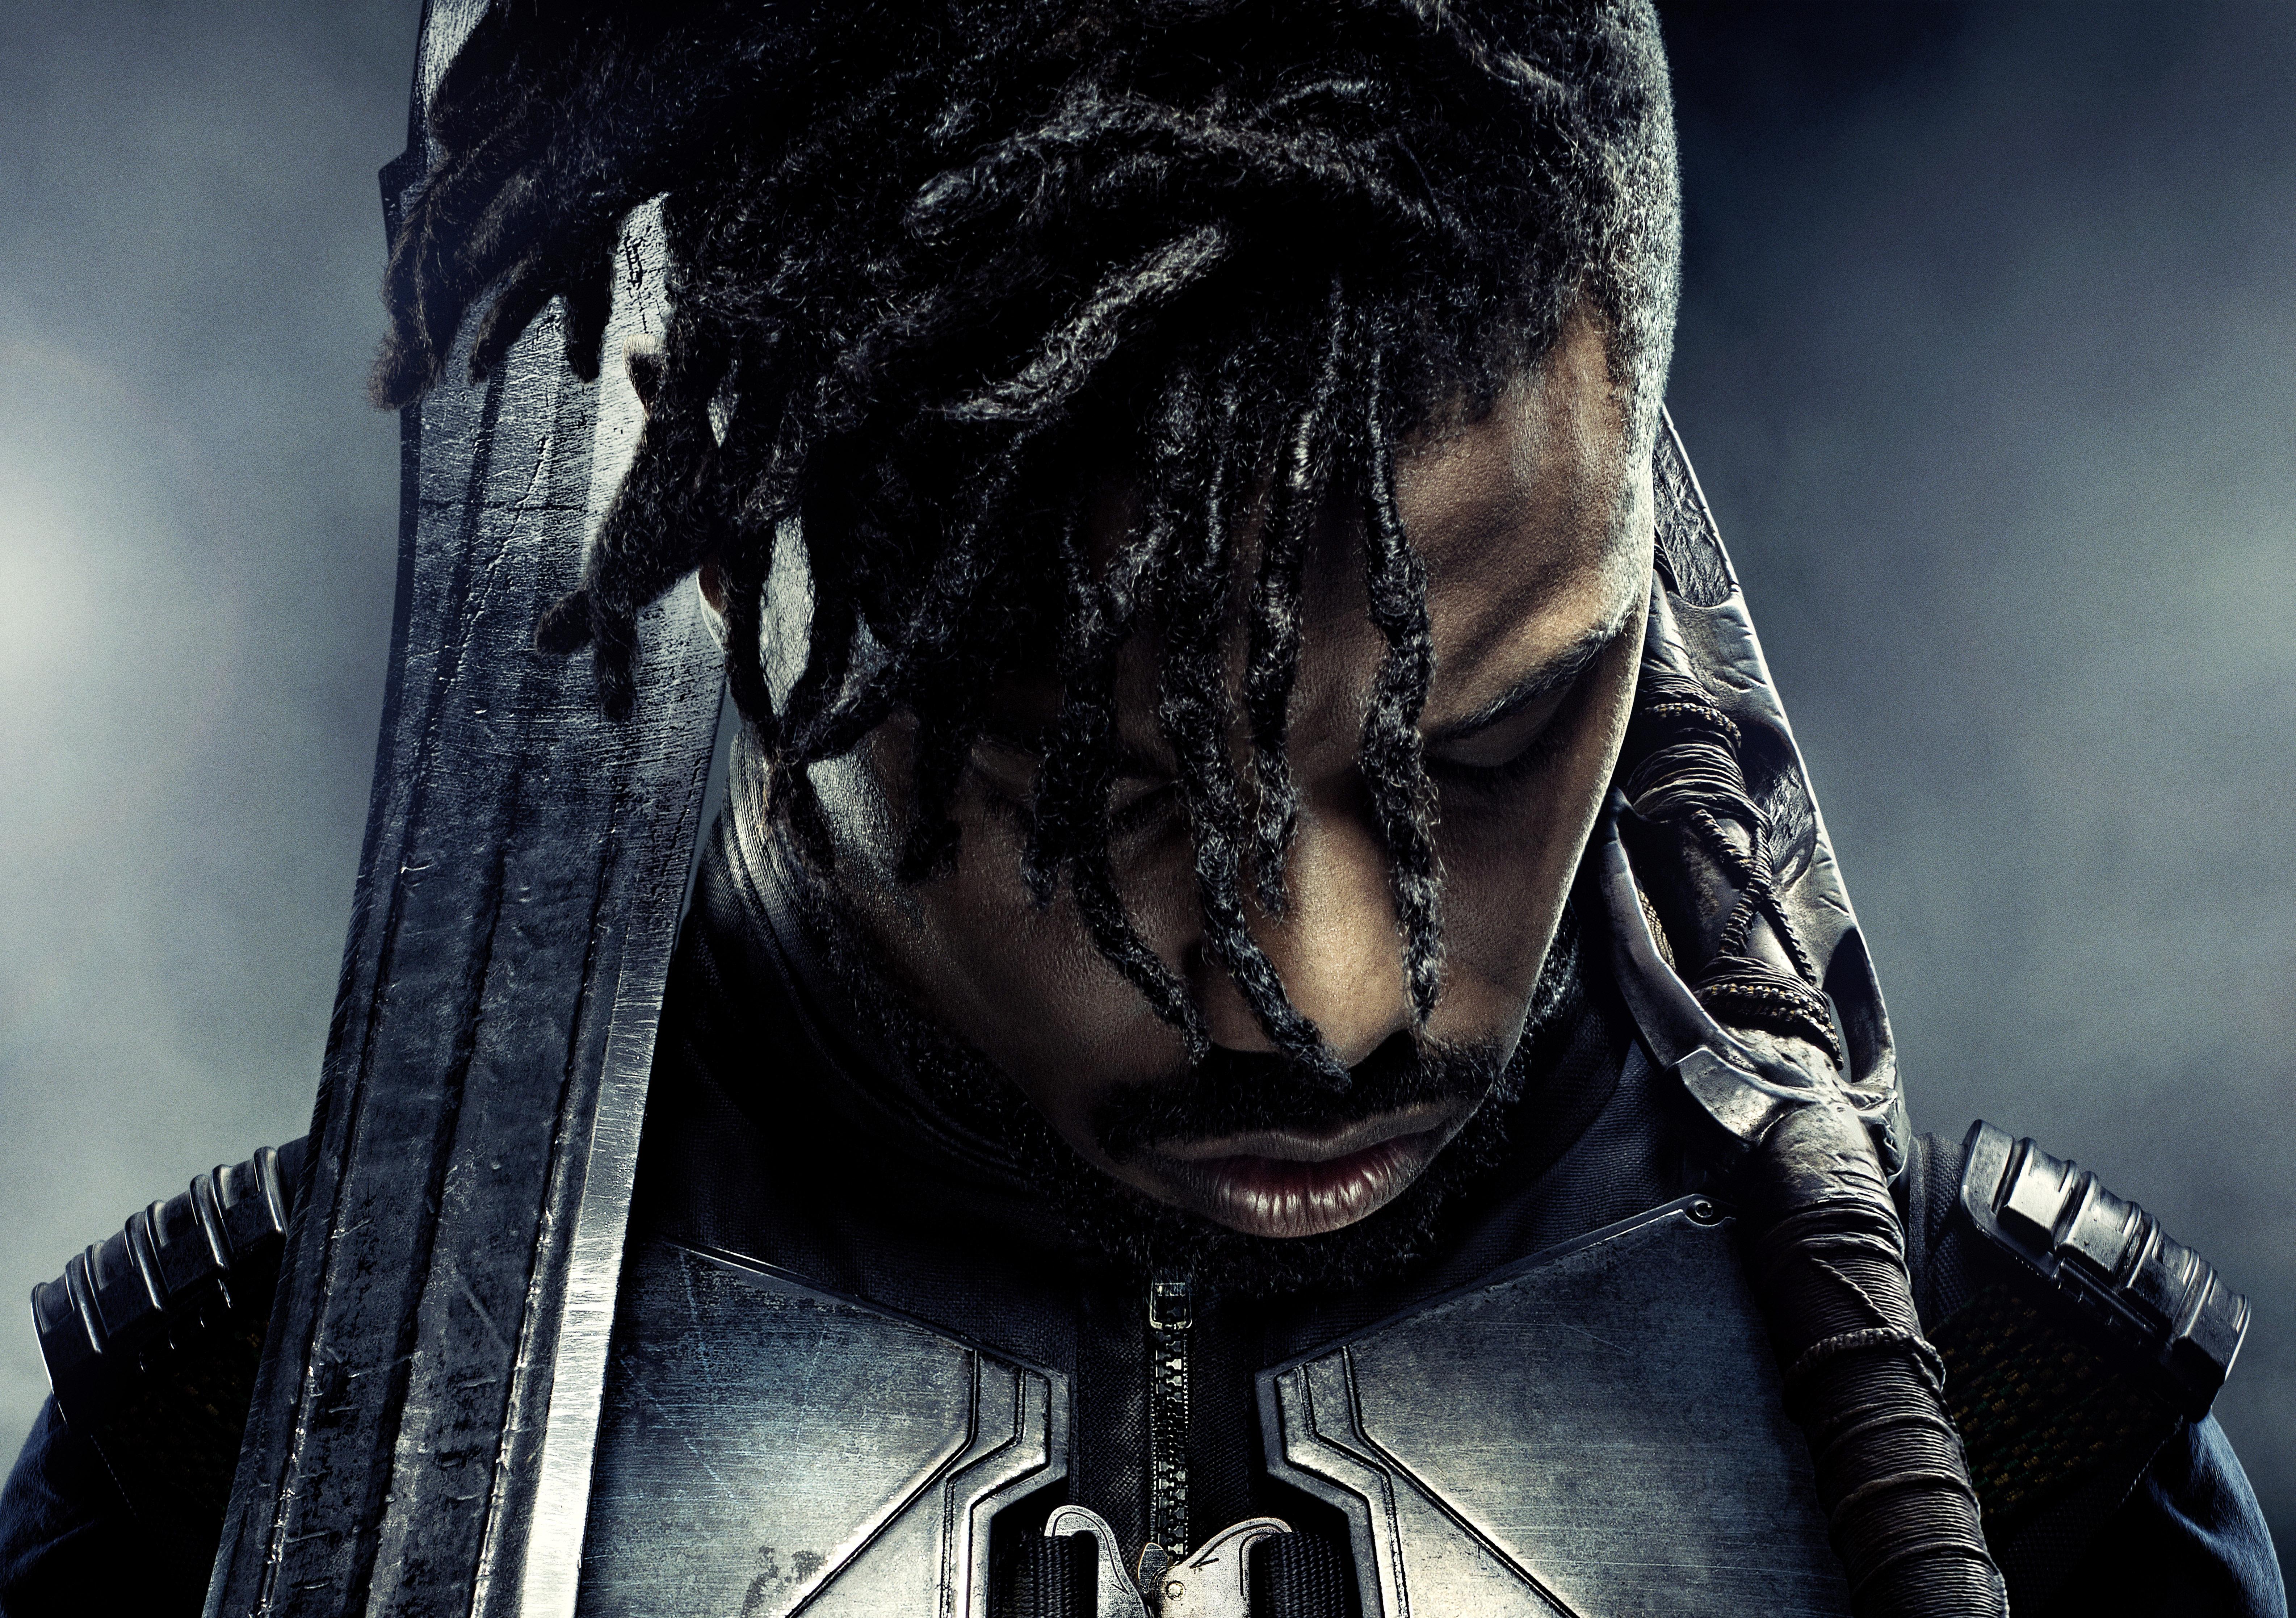 Top 13 Pubg Wallpapers In Full Hd For Pc And Phone: Michael B Jordan Black Panther Poster 4k 5k, HD Movies, 4k